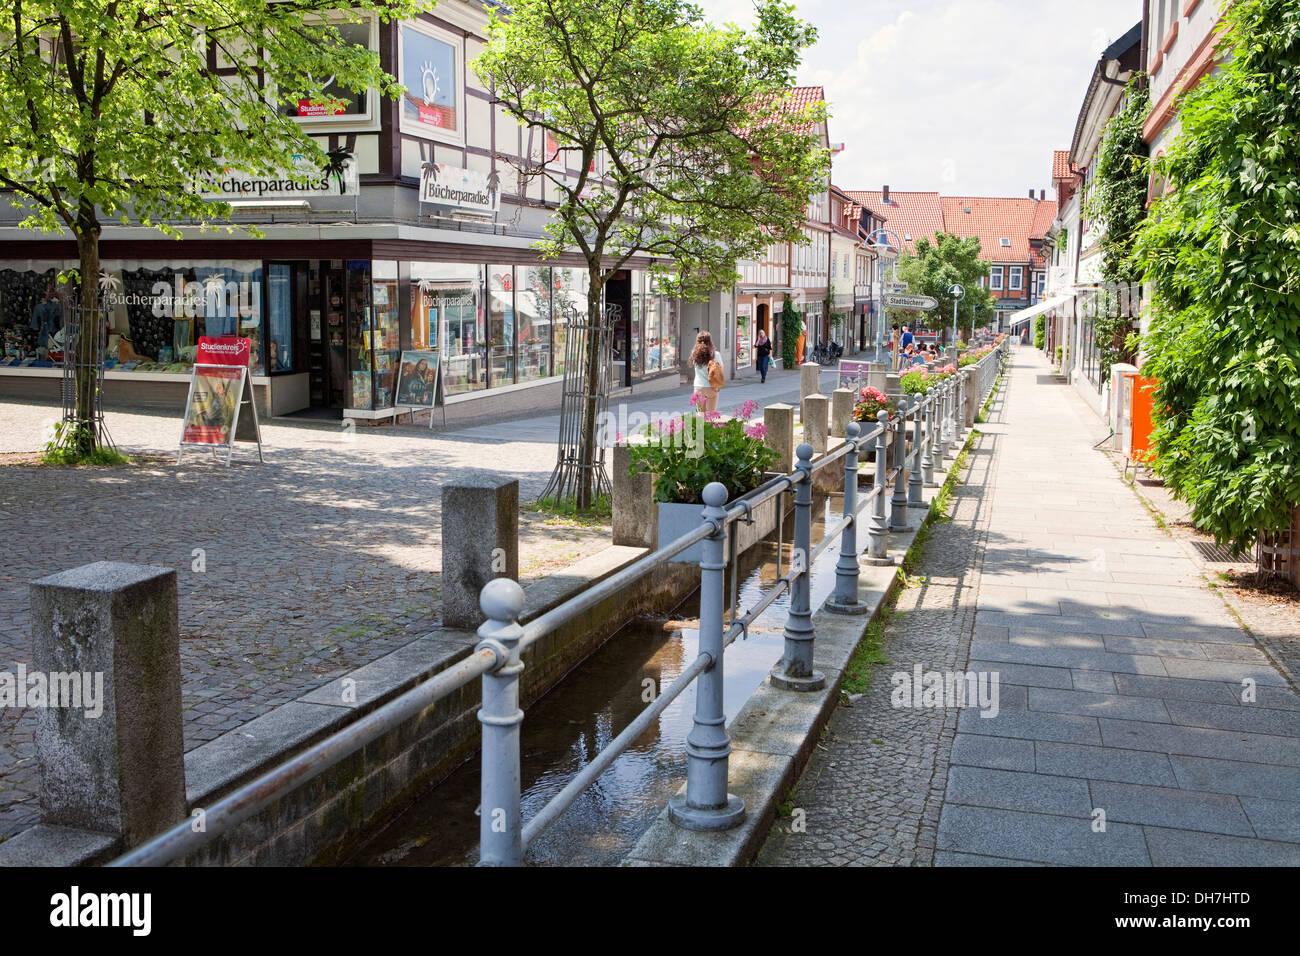 Marktstrasse, Alfeld, Leine, Lower Saxony, Germany, Europe - Stock Image